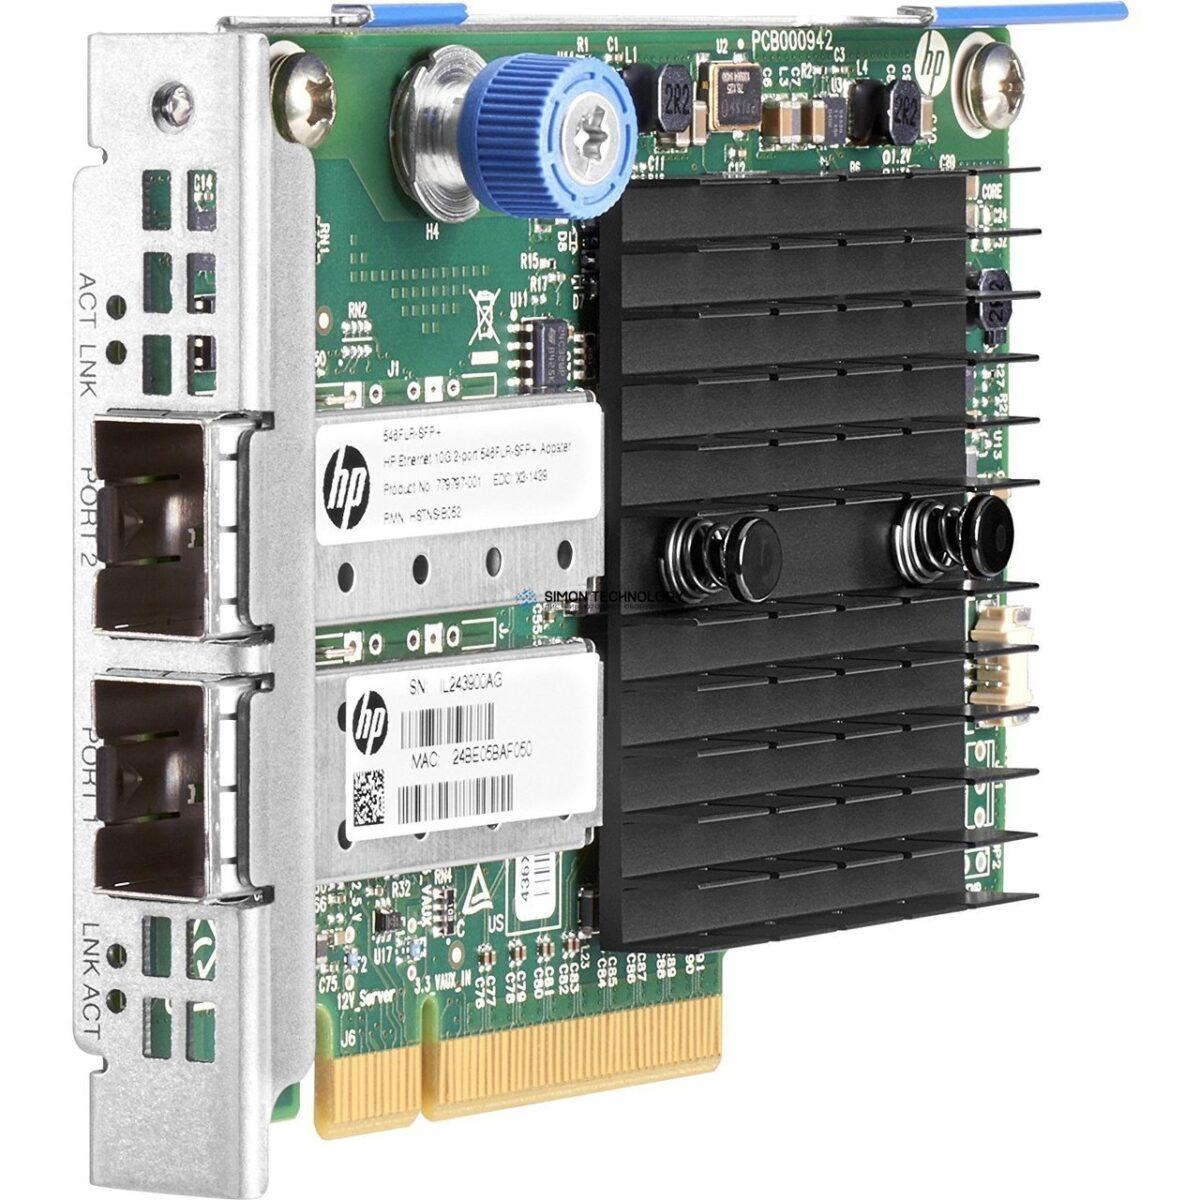 Сетевая карта HP HP Ethernet 10Gb 2P 546FLR Adptr (790315-001)